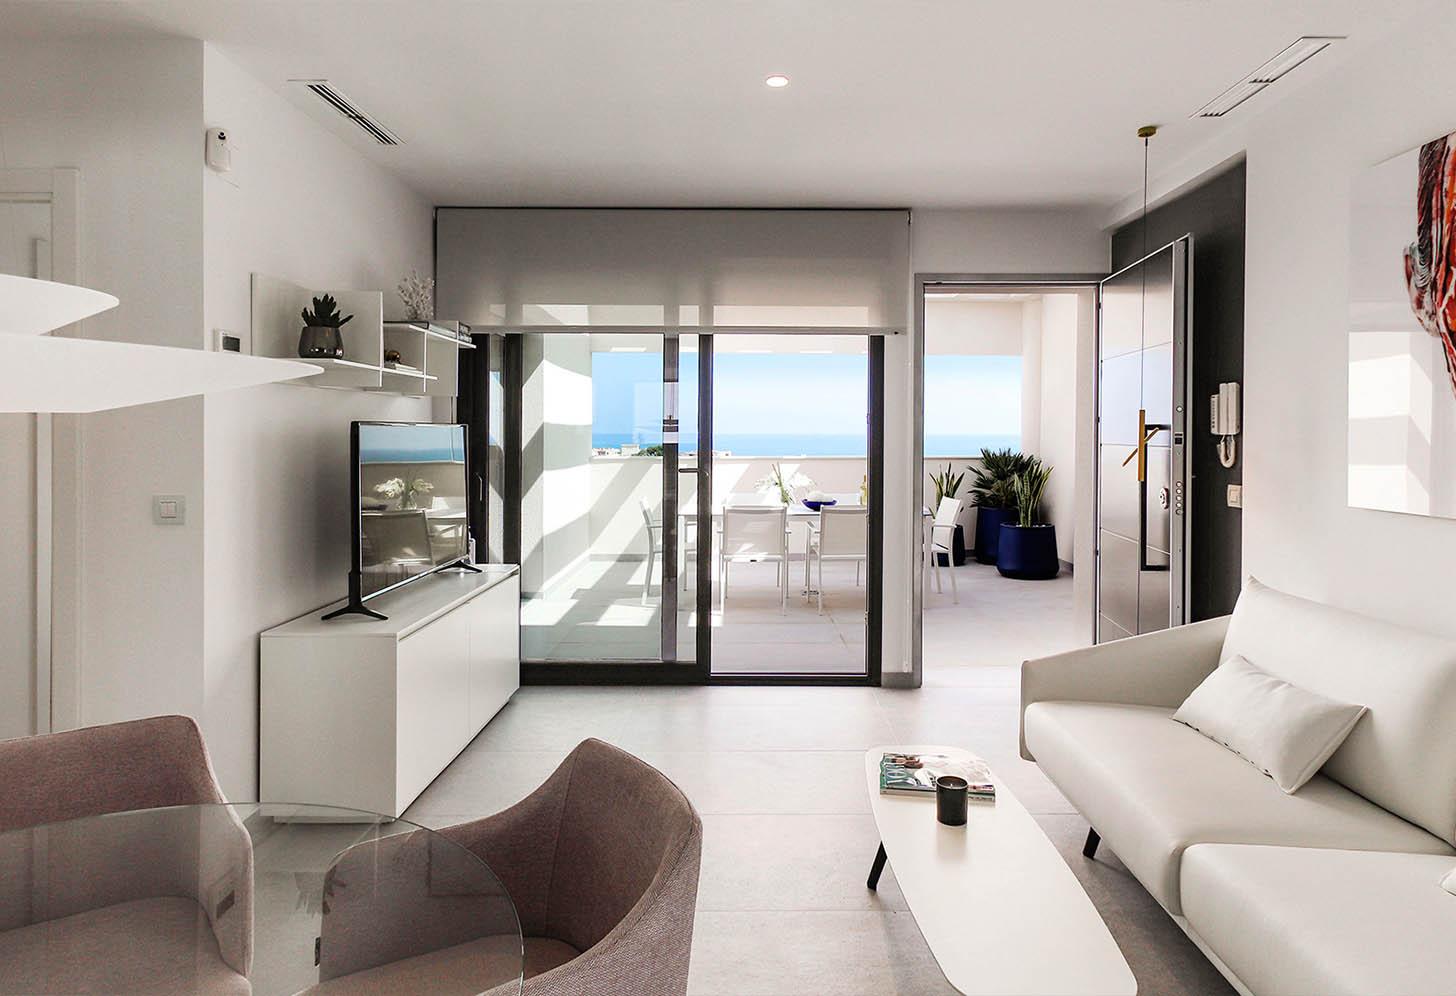 immobilier neuf espagne costa blanca on-3b essence penthouse salon